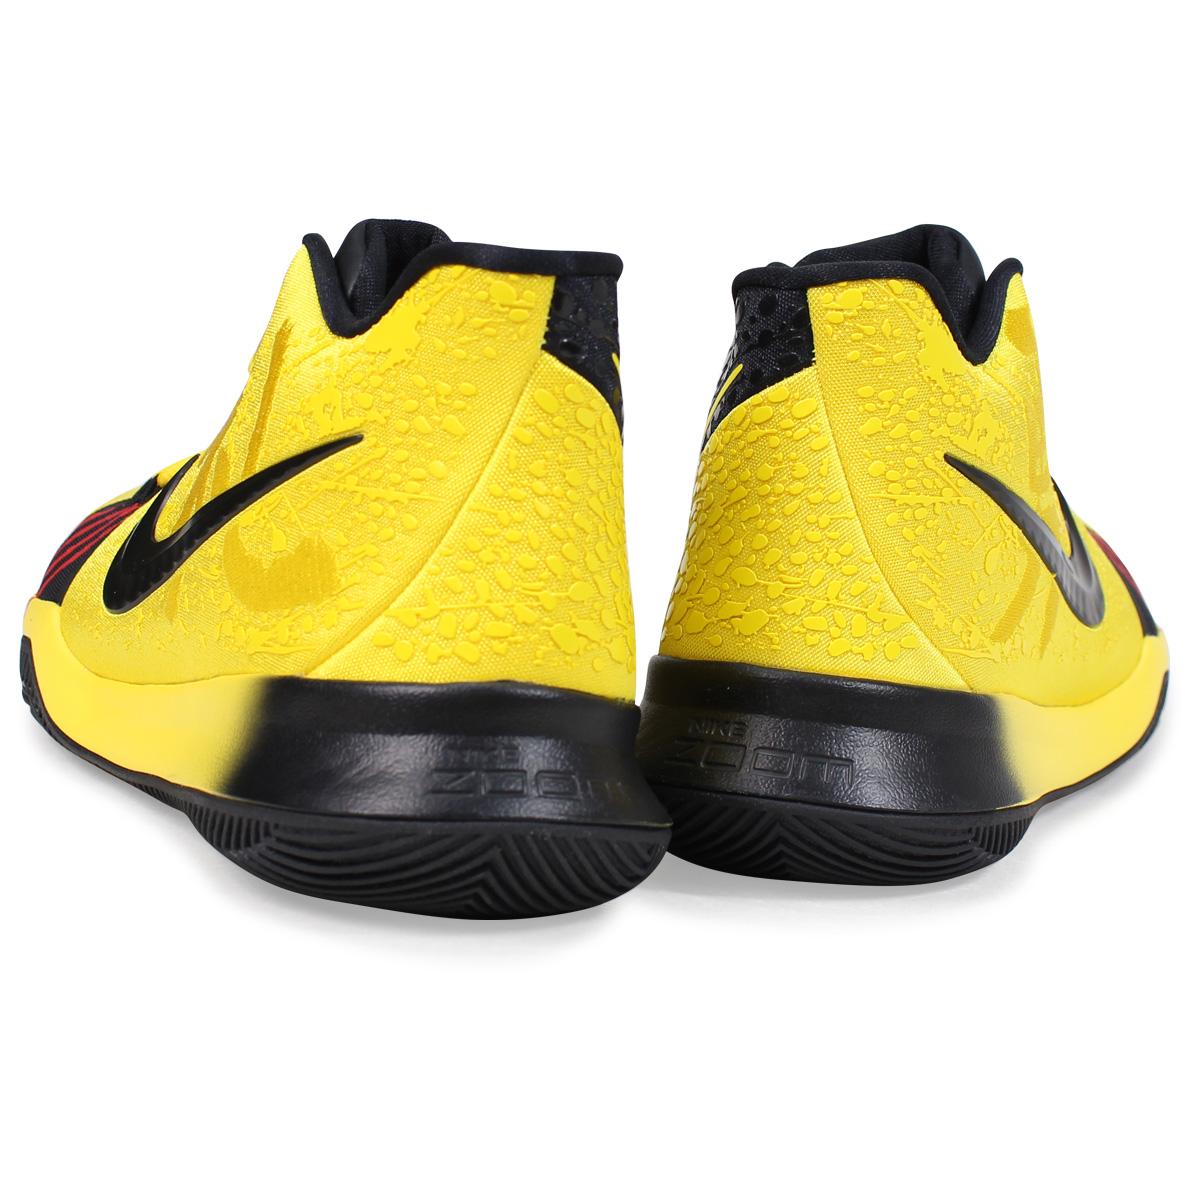 pretty nice 25062 43dcb NIKE KYRIE 3 MAMBA MENTALITY EP BRUCE LEE Nike chi Lee 3 sneakers men  AJ1692-700 yellow